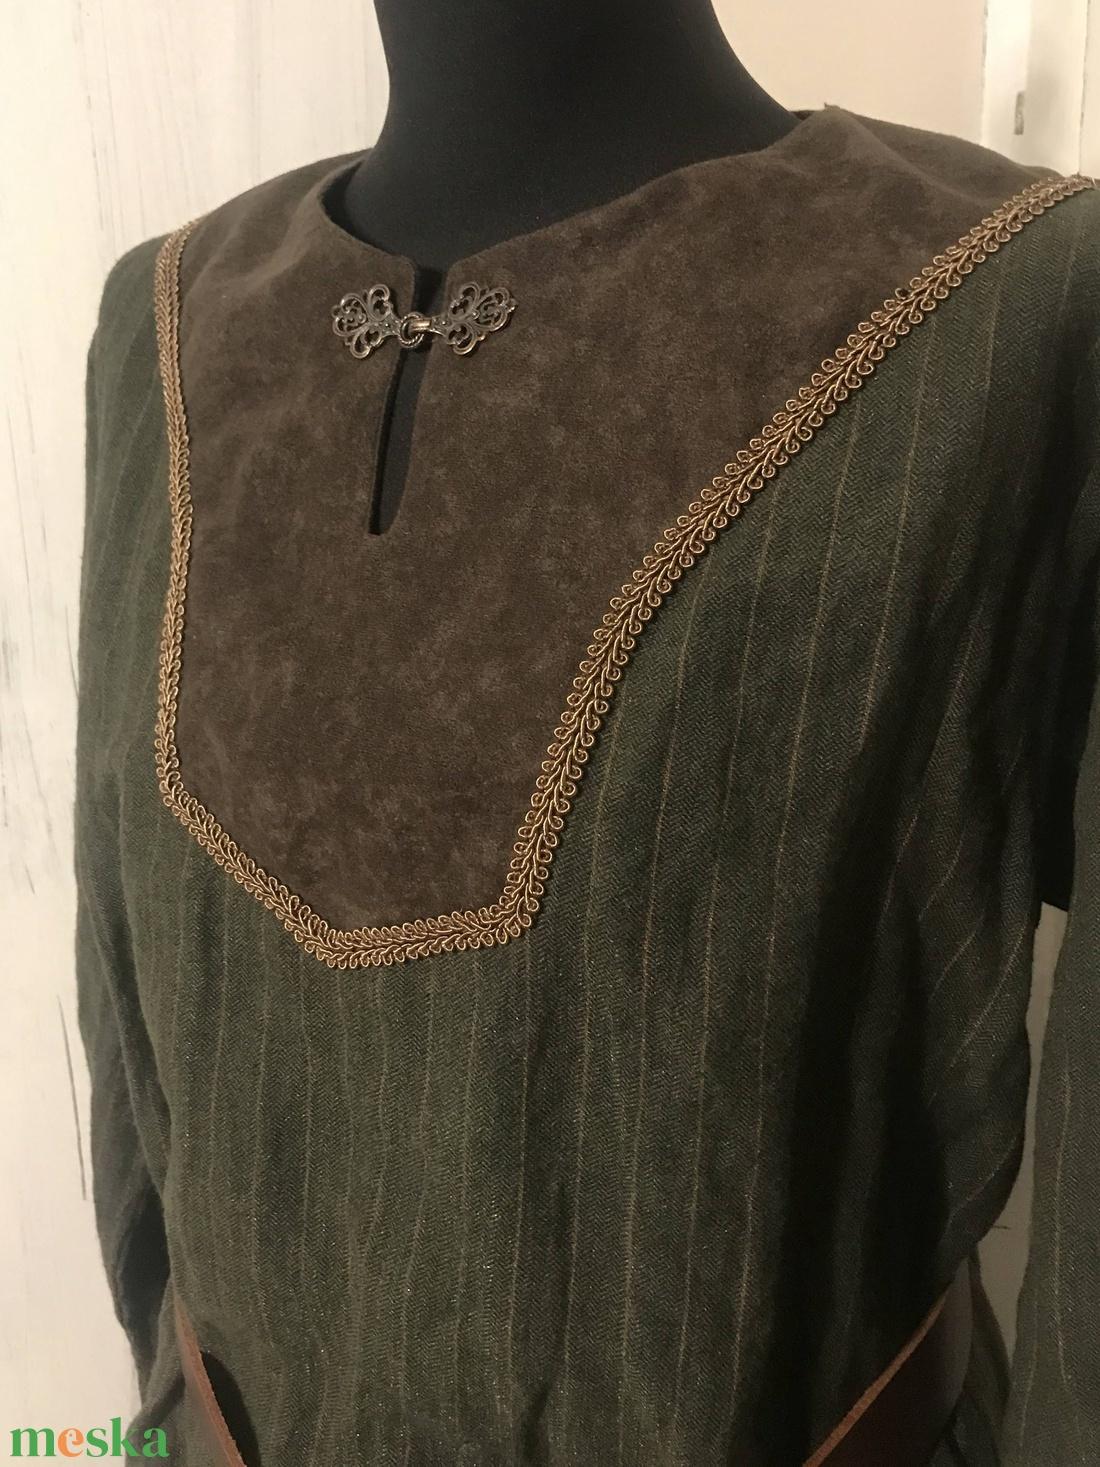 Tunika, kaftán  - zöld-barna - harcosoknak :) - ruha & divat - férfi ruha - Meska.hu